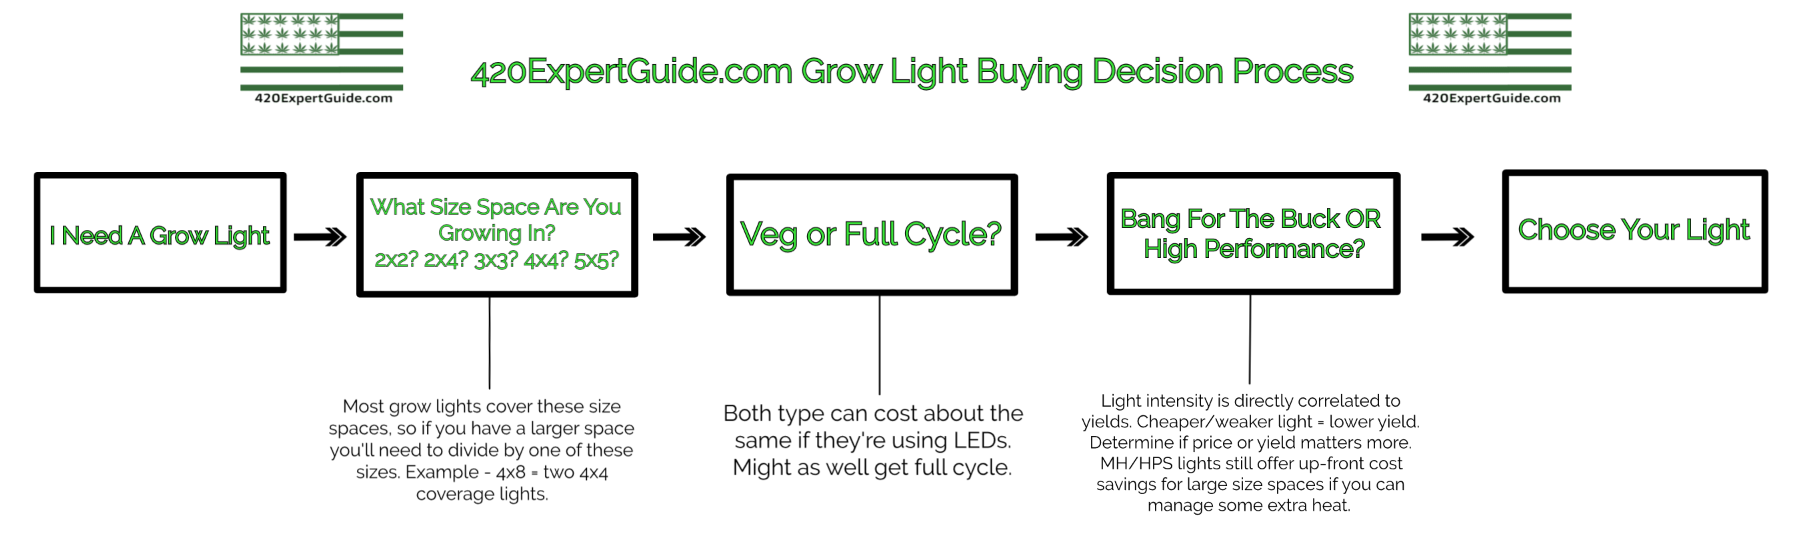 best LED grow light infographic